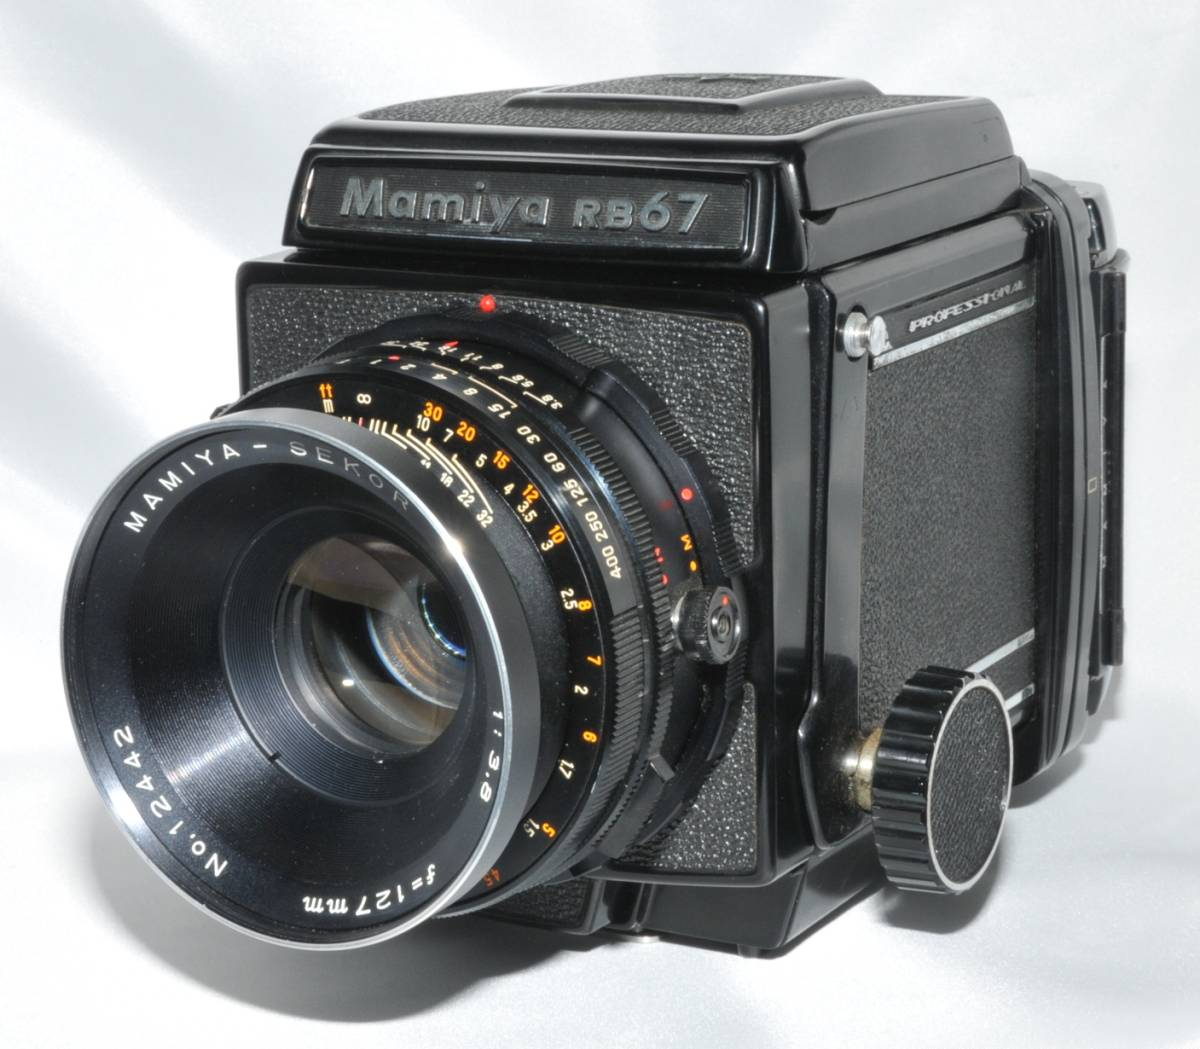 Mamiya マミヤ RB67 127mm F3.8 ジャンク